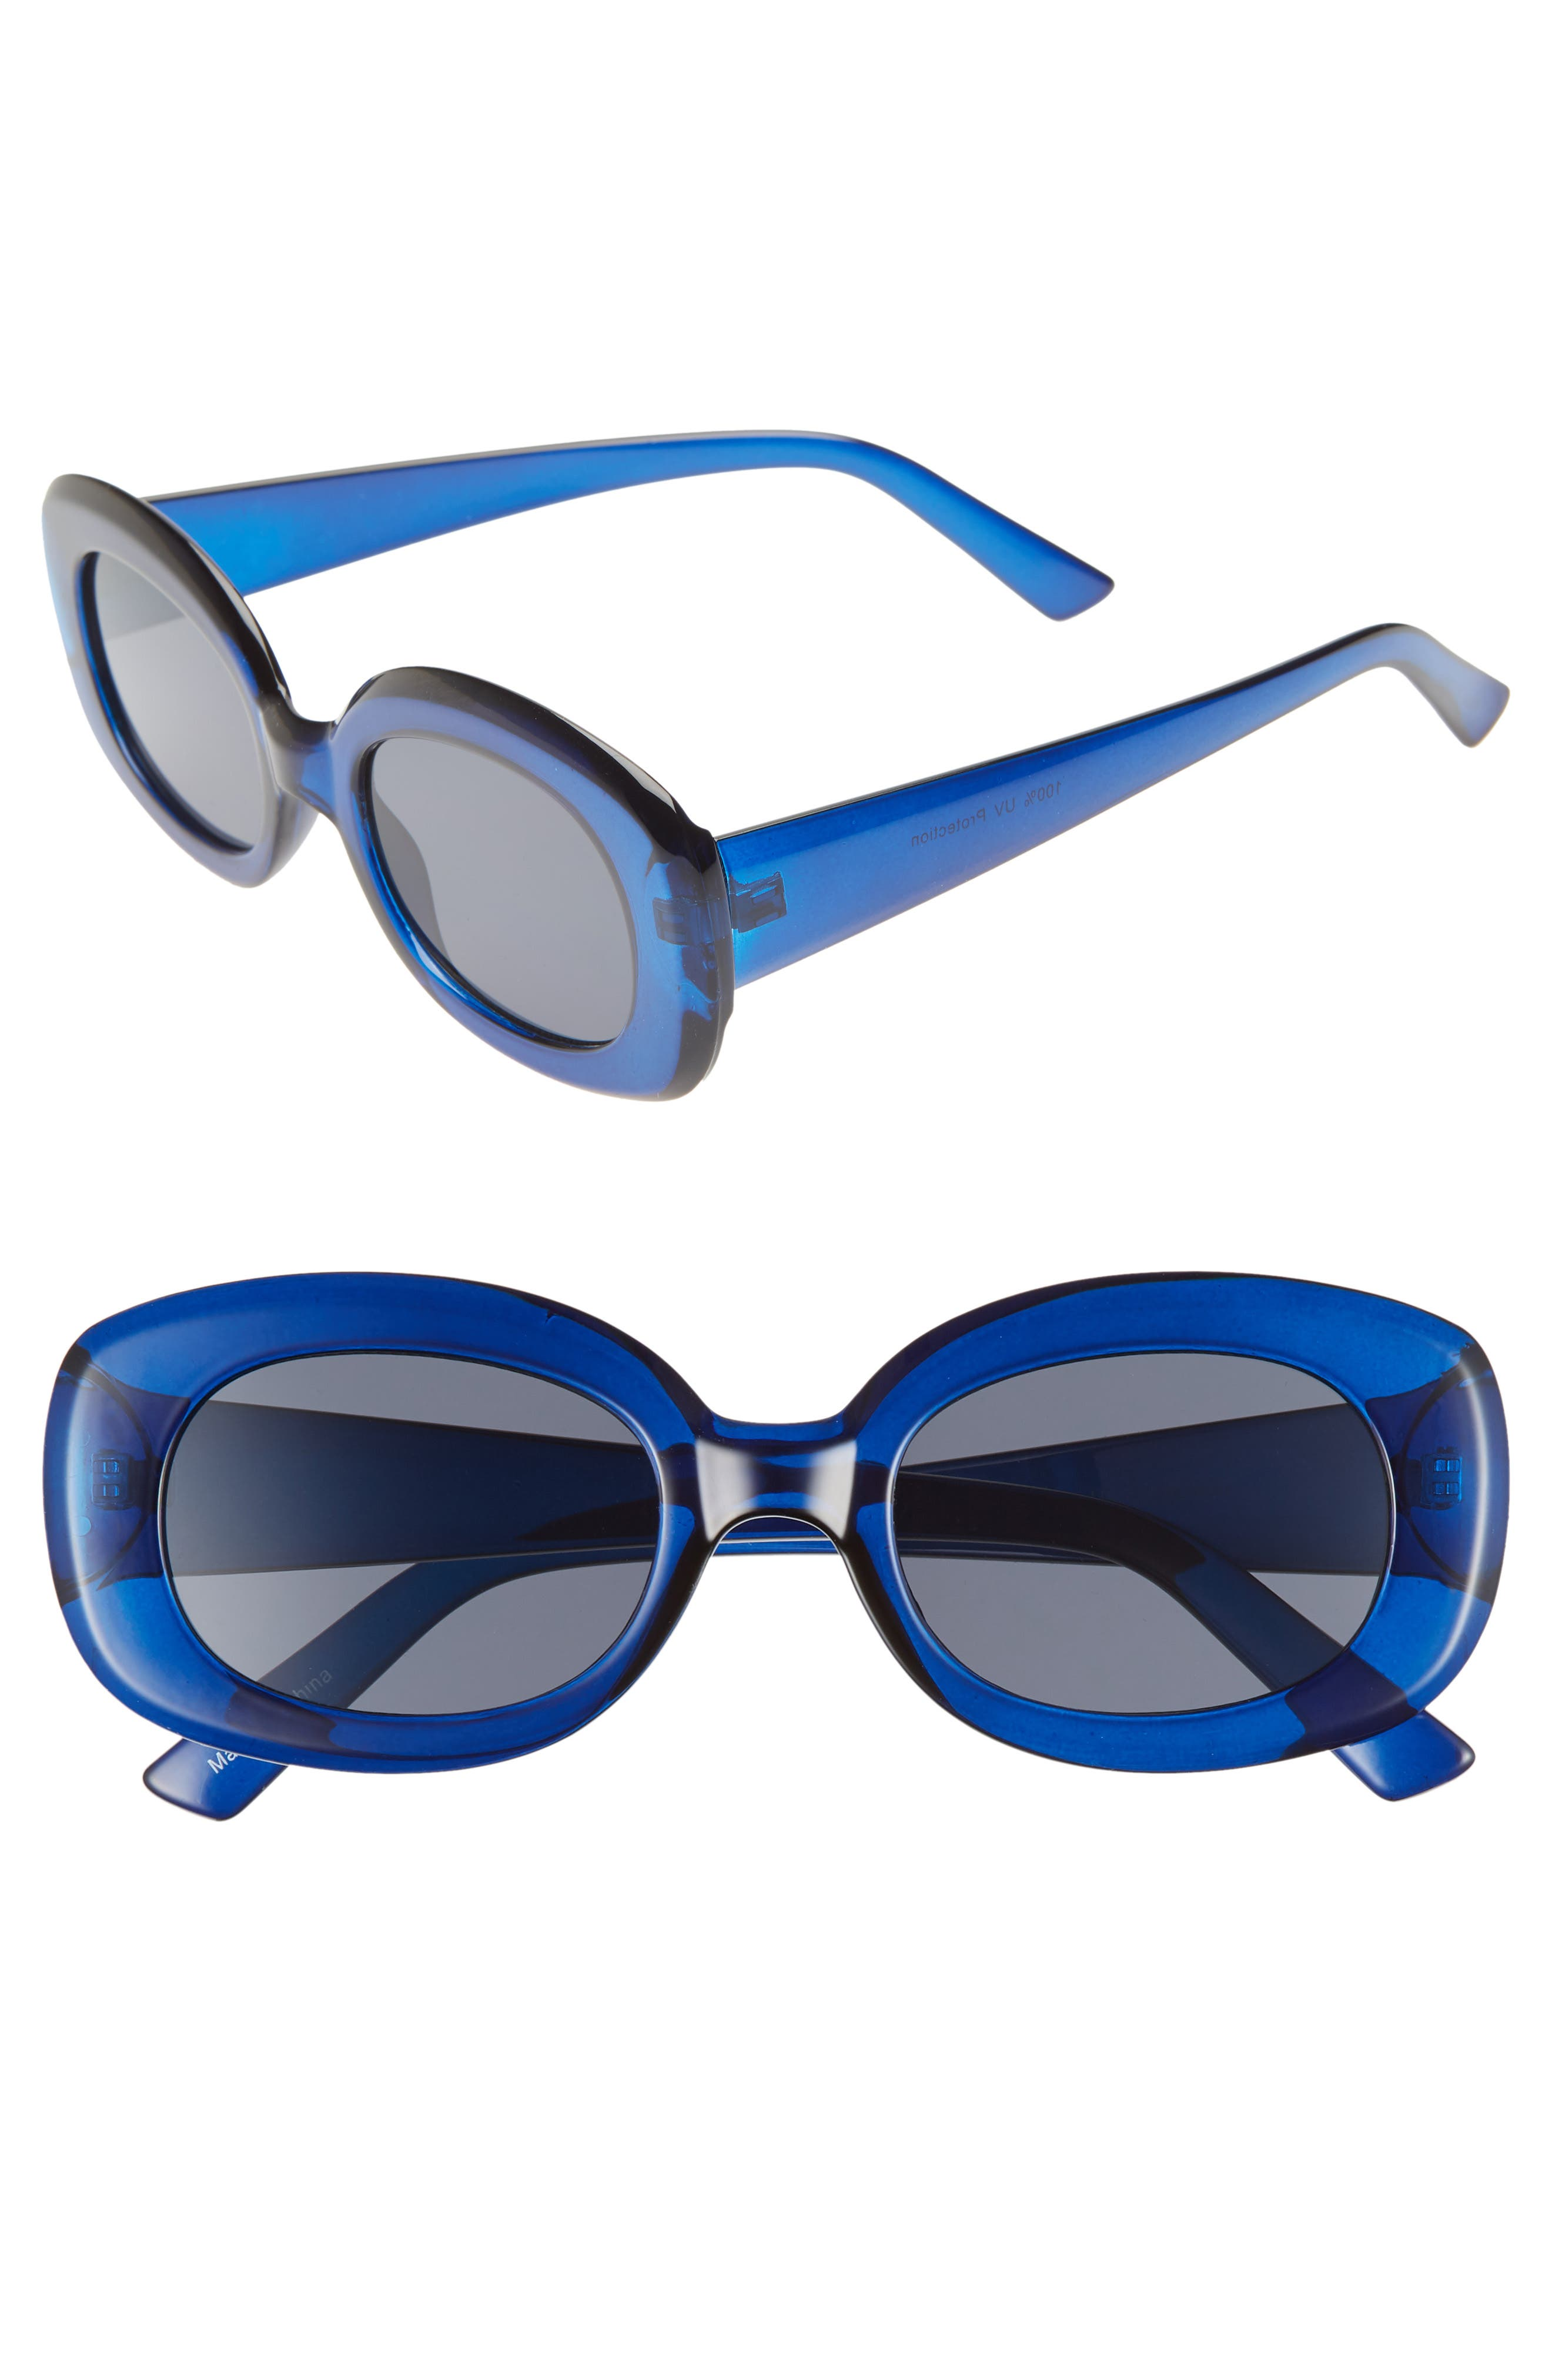 66mm Oval Sunglasses,                         Main,                         color, BLUE/ BLACK